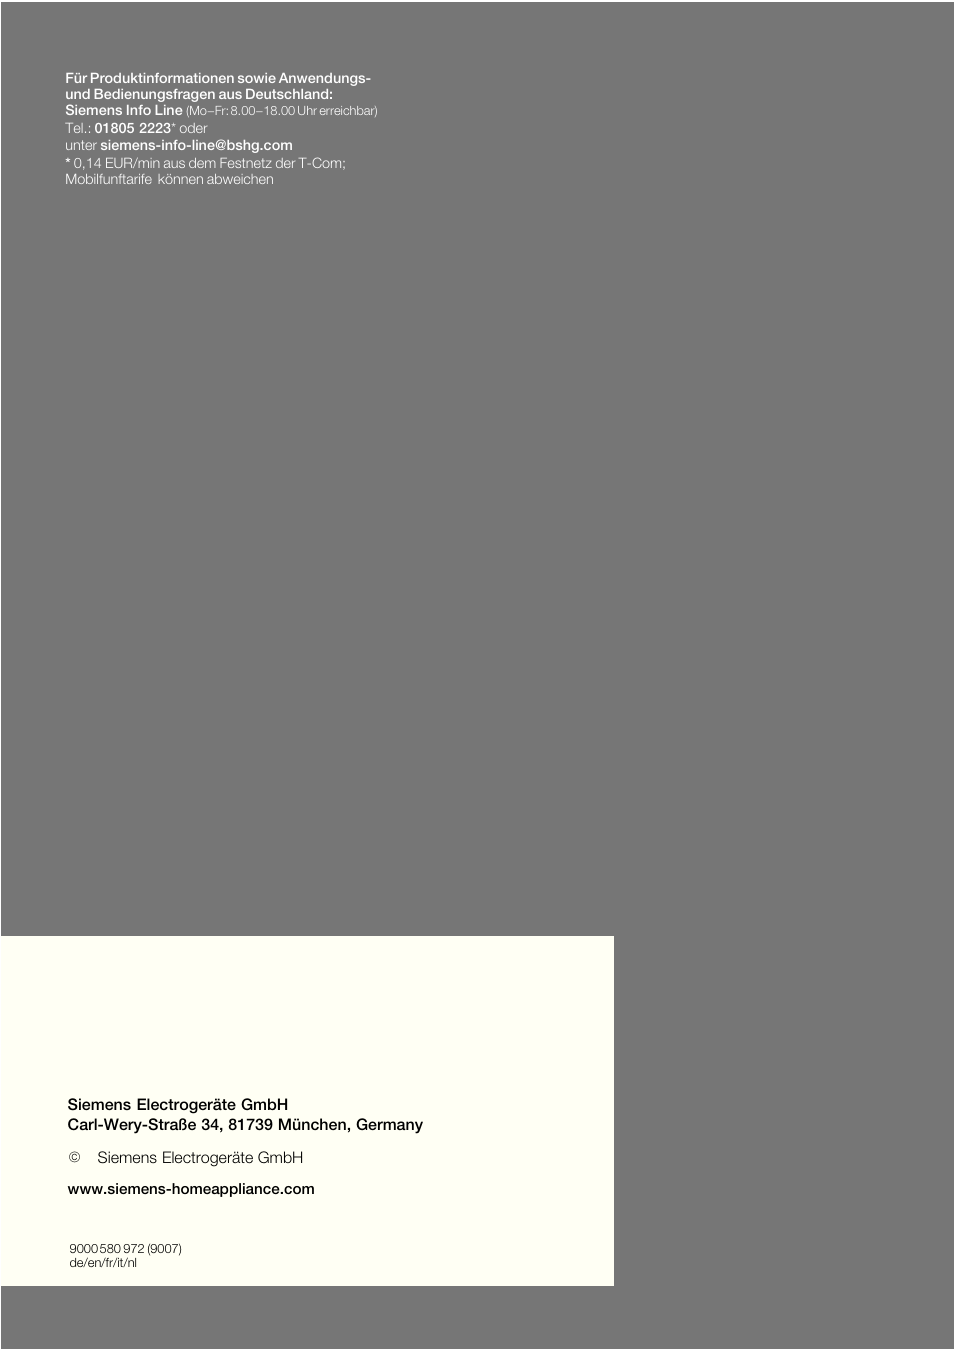 siemens ka62dp91 user manual page 115 115 also for ka62da71 ka62ds51 ka63da71. Black Bedroom Furniture Sets. Home Design Ideas